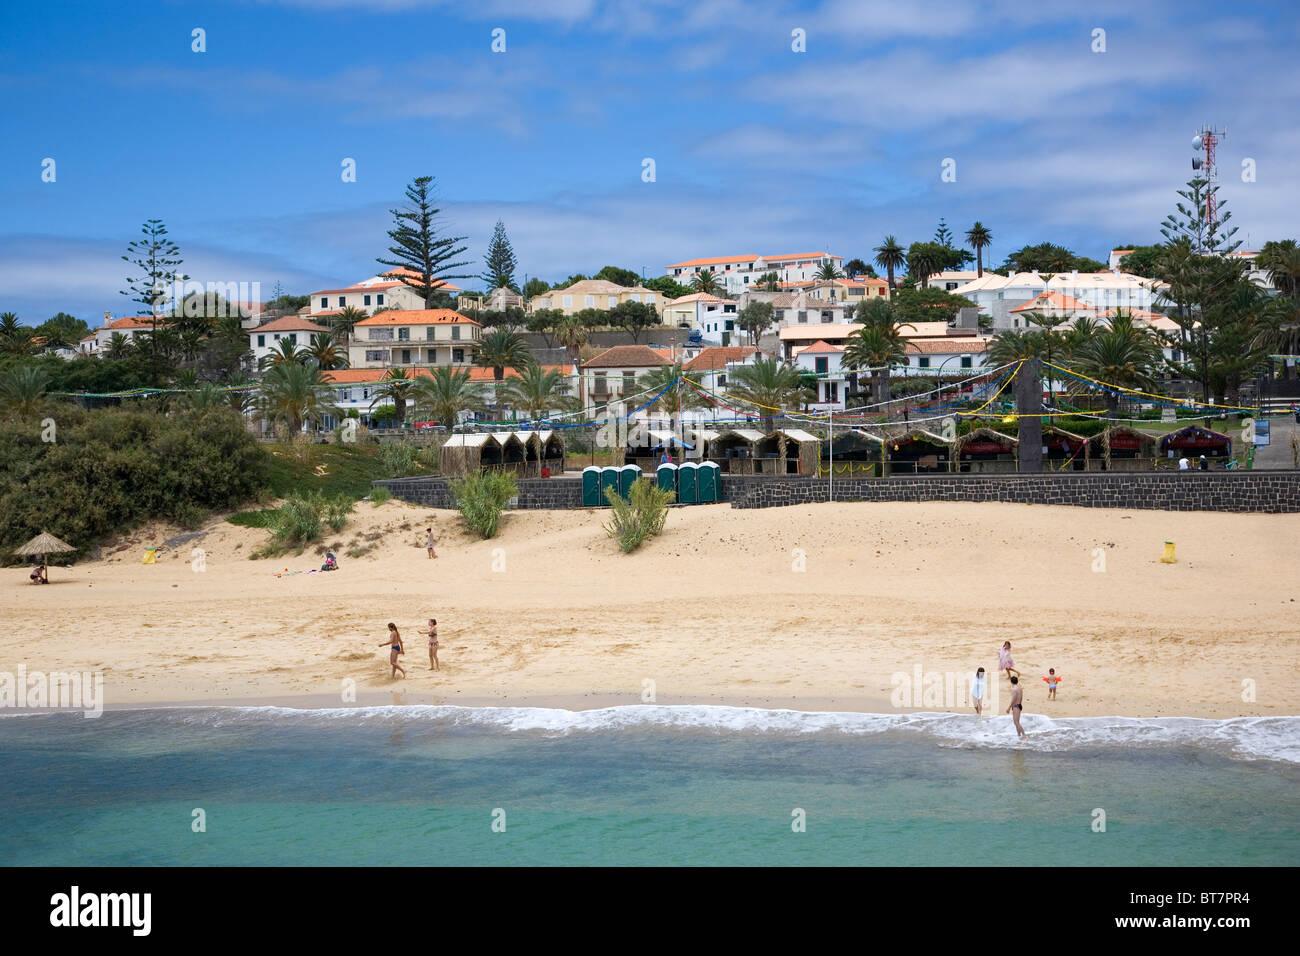 Beach at Vila Baleira, Main town in Porto Santo - Stock Image